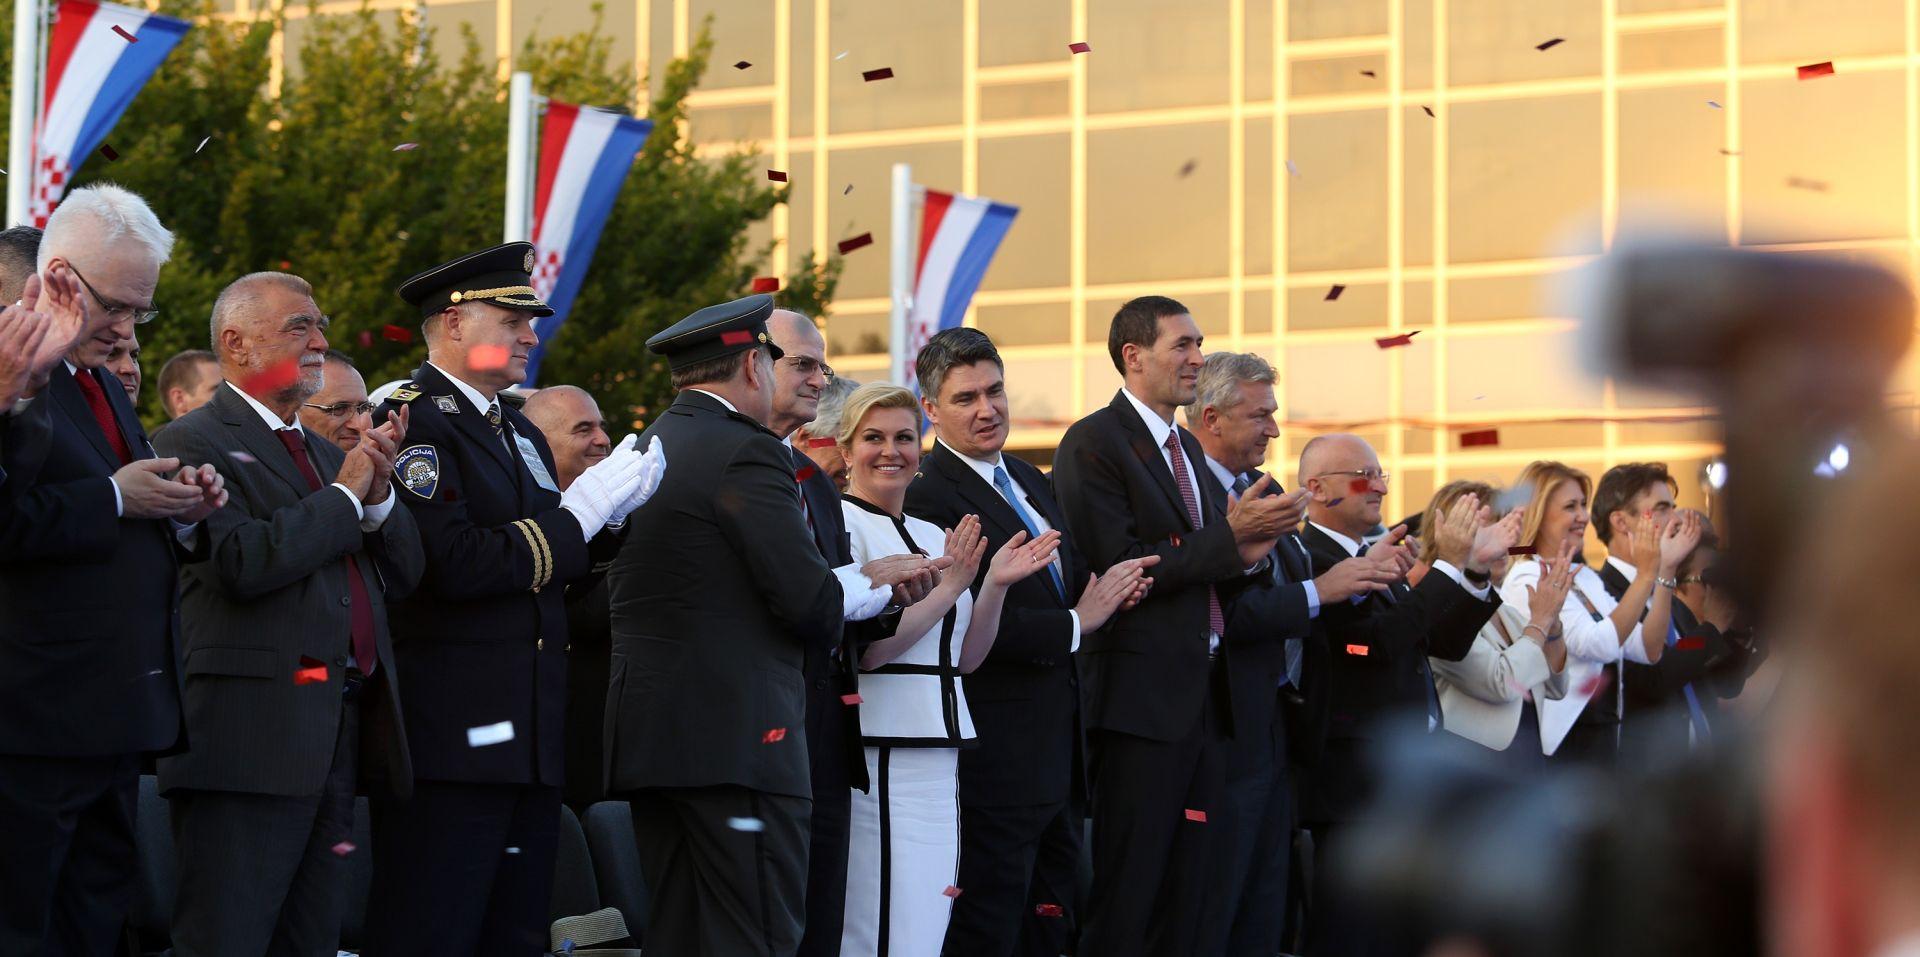 DOJMOVI Ministar Matić pod dojmom mimohoda, Peter Galbraith oduševljen